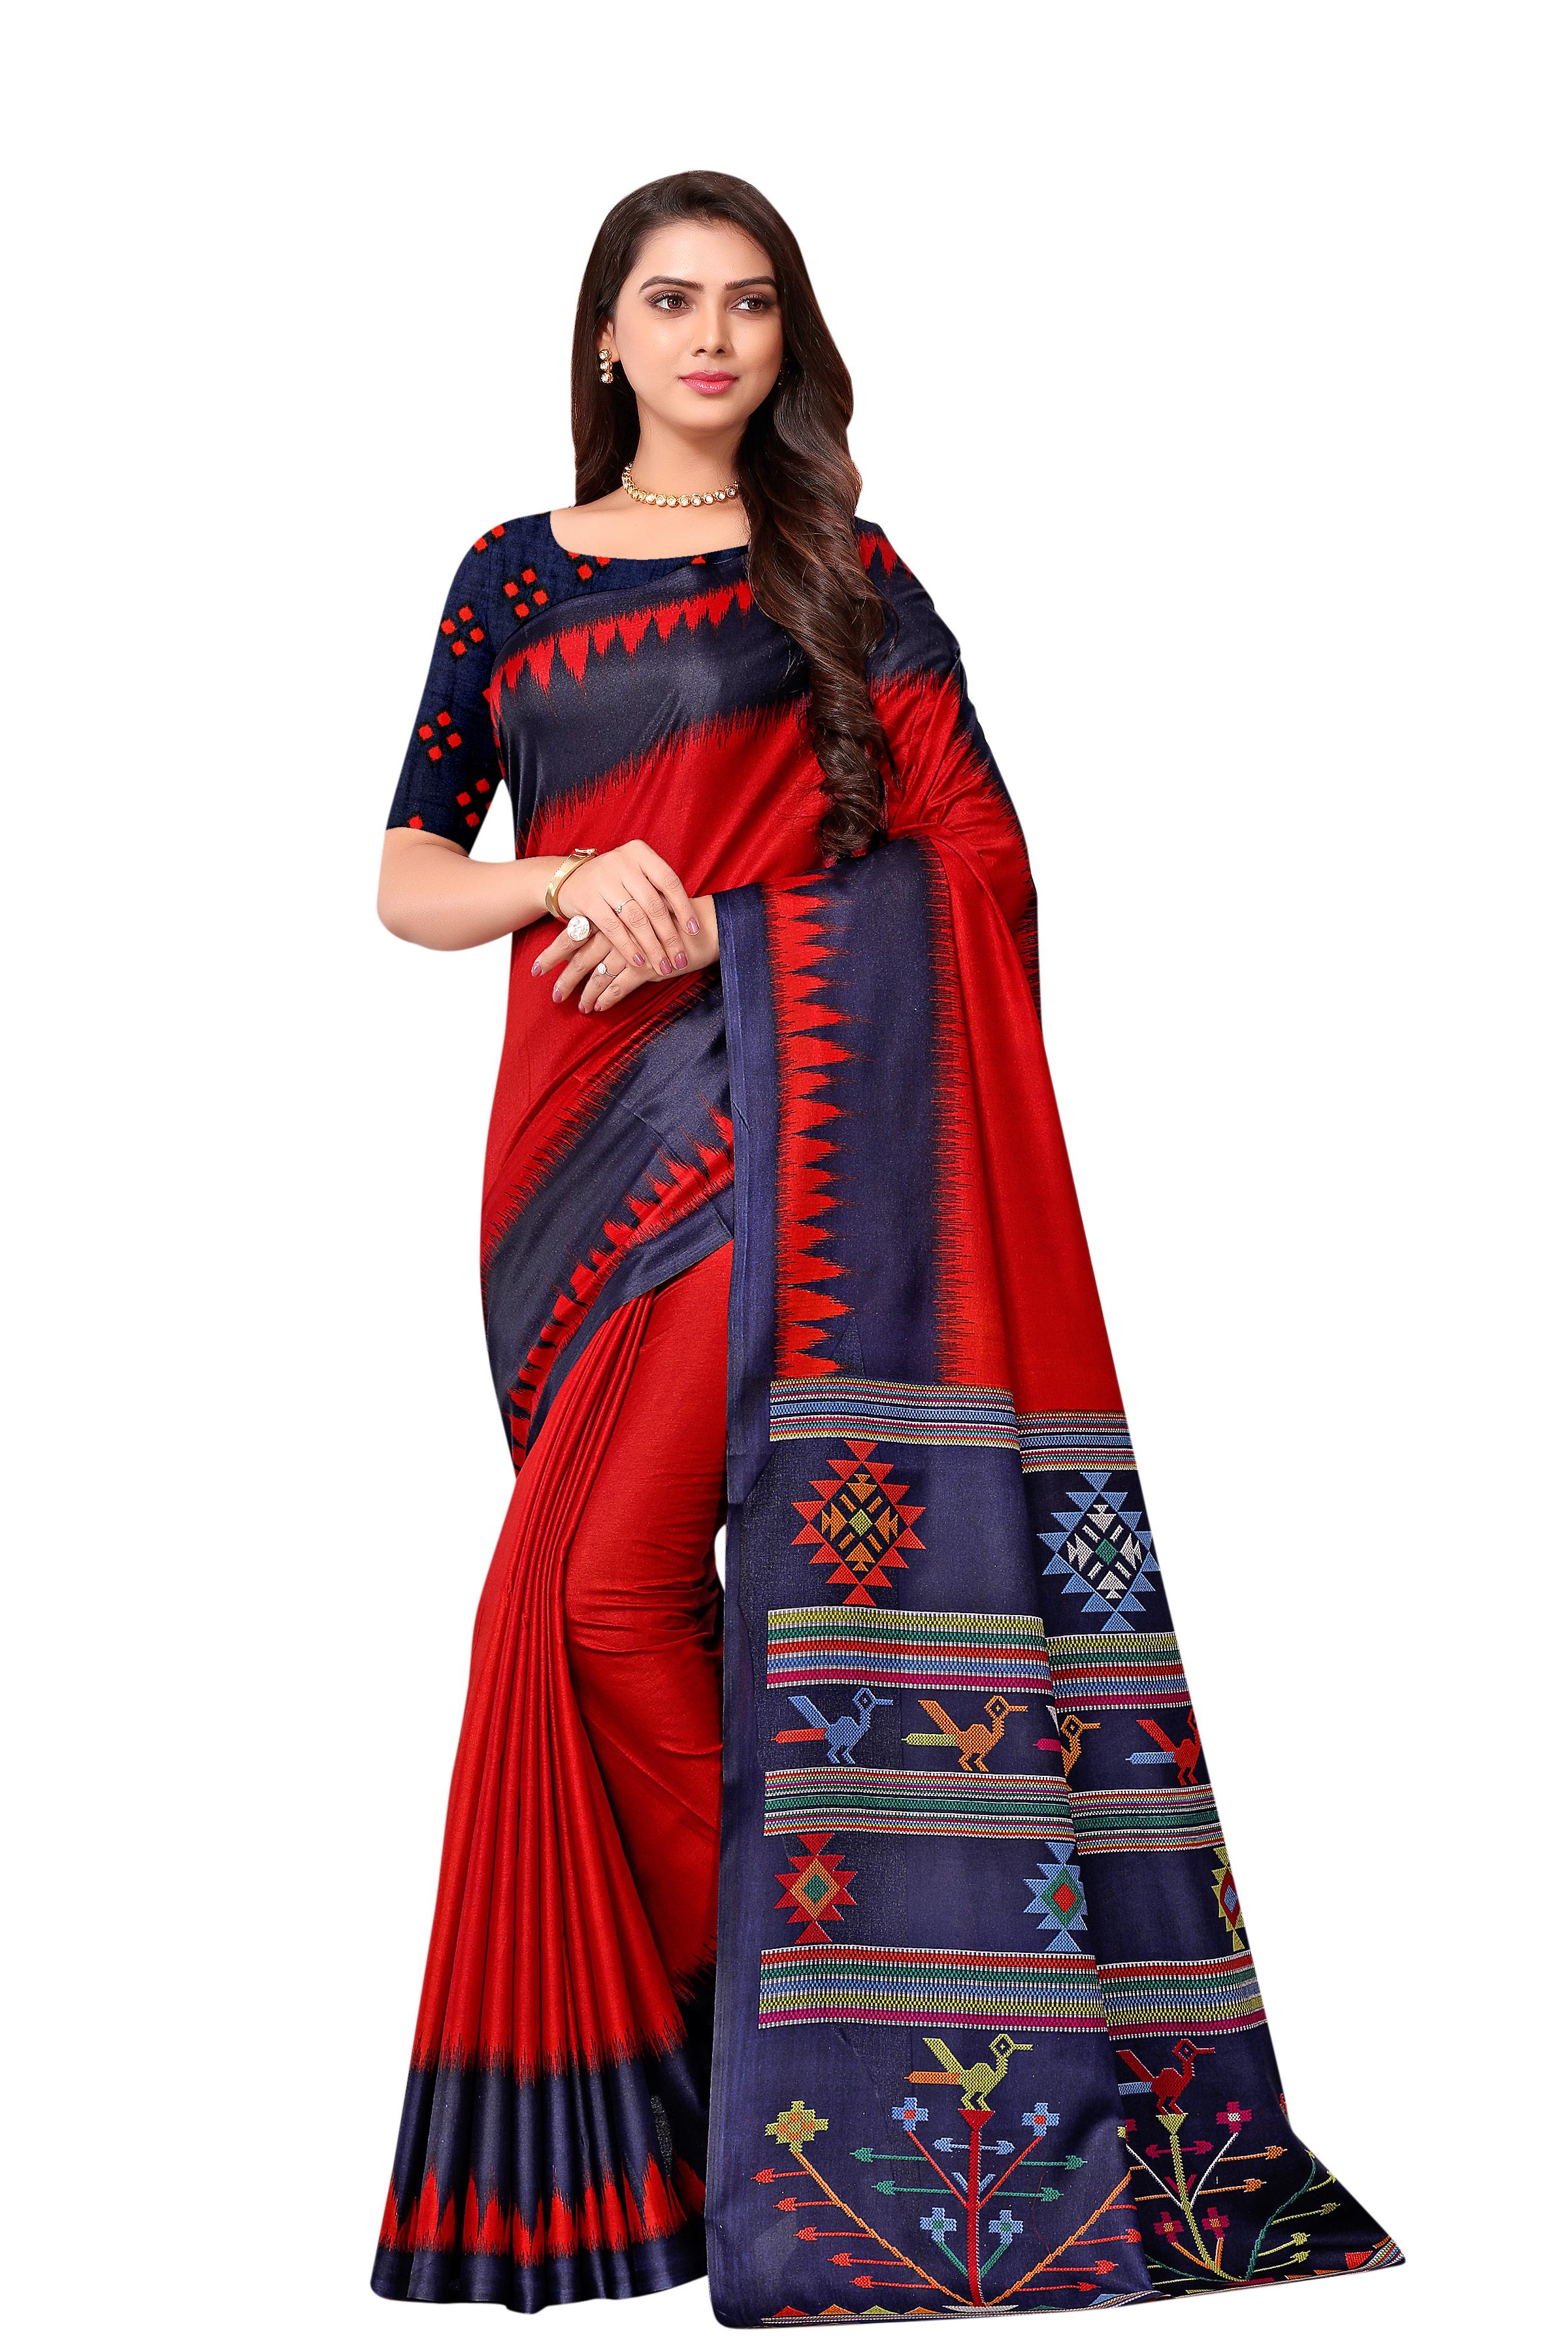 4d0676cb28d Jaanvi Fashion Designs Online Store - Shop latest Jaanvi Fashion Art Silk  Sarees